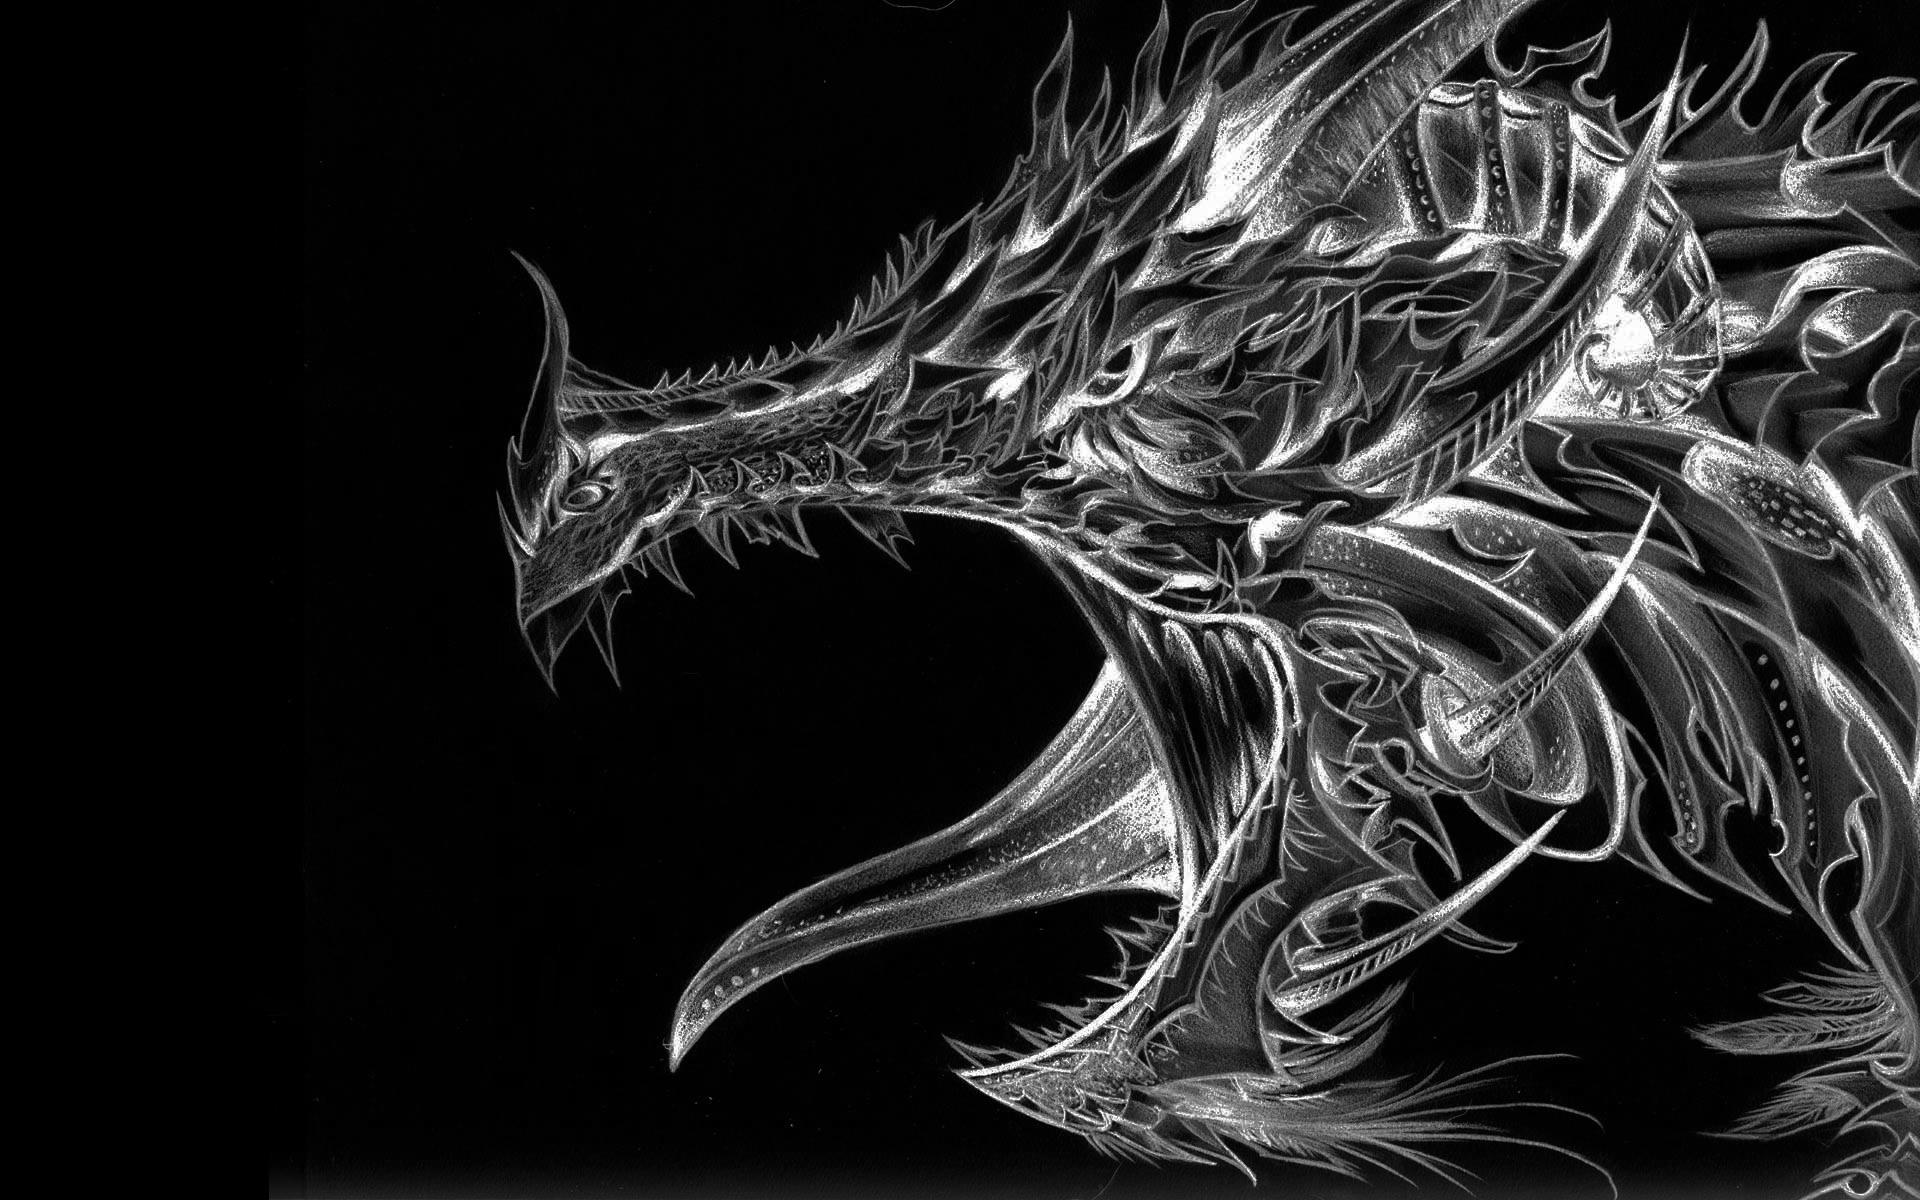 Dragons Wallpaper 1920x1200 Dragons 1920x1200